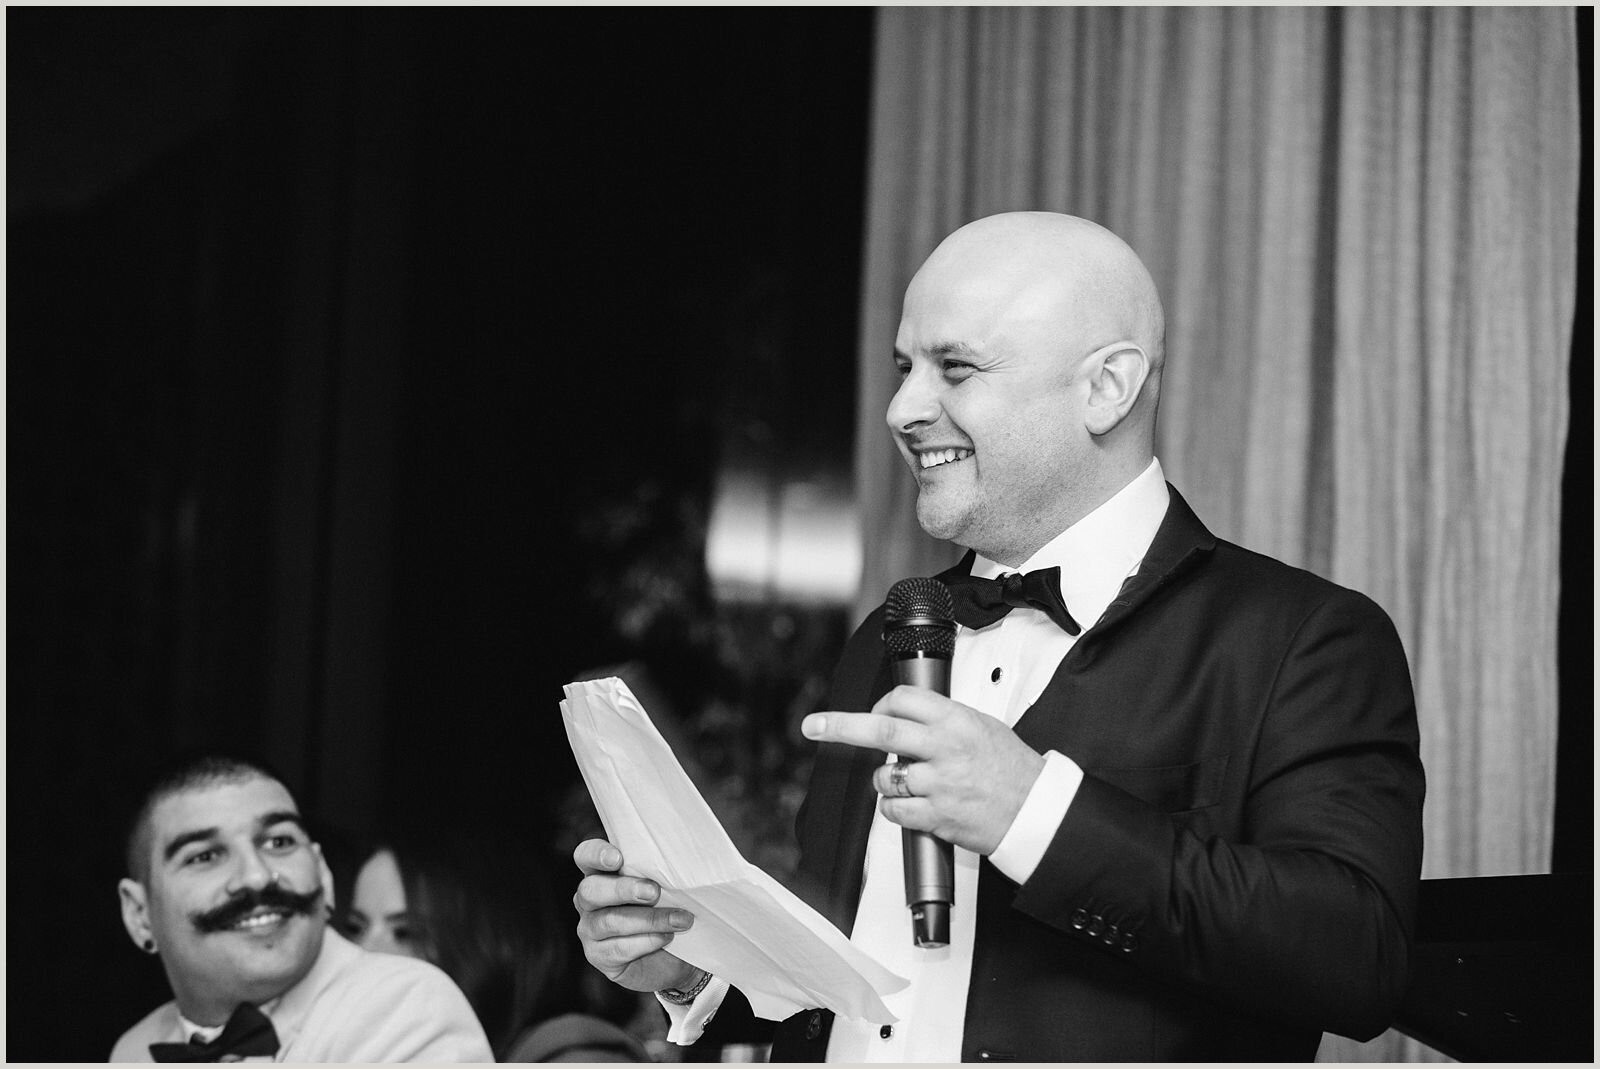 joseph_koprek_wedding_melbourne_the_prince_deck_0091.jpg